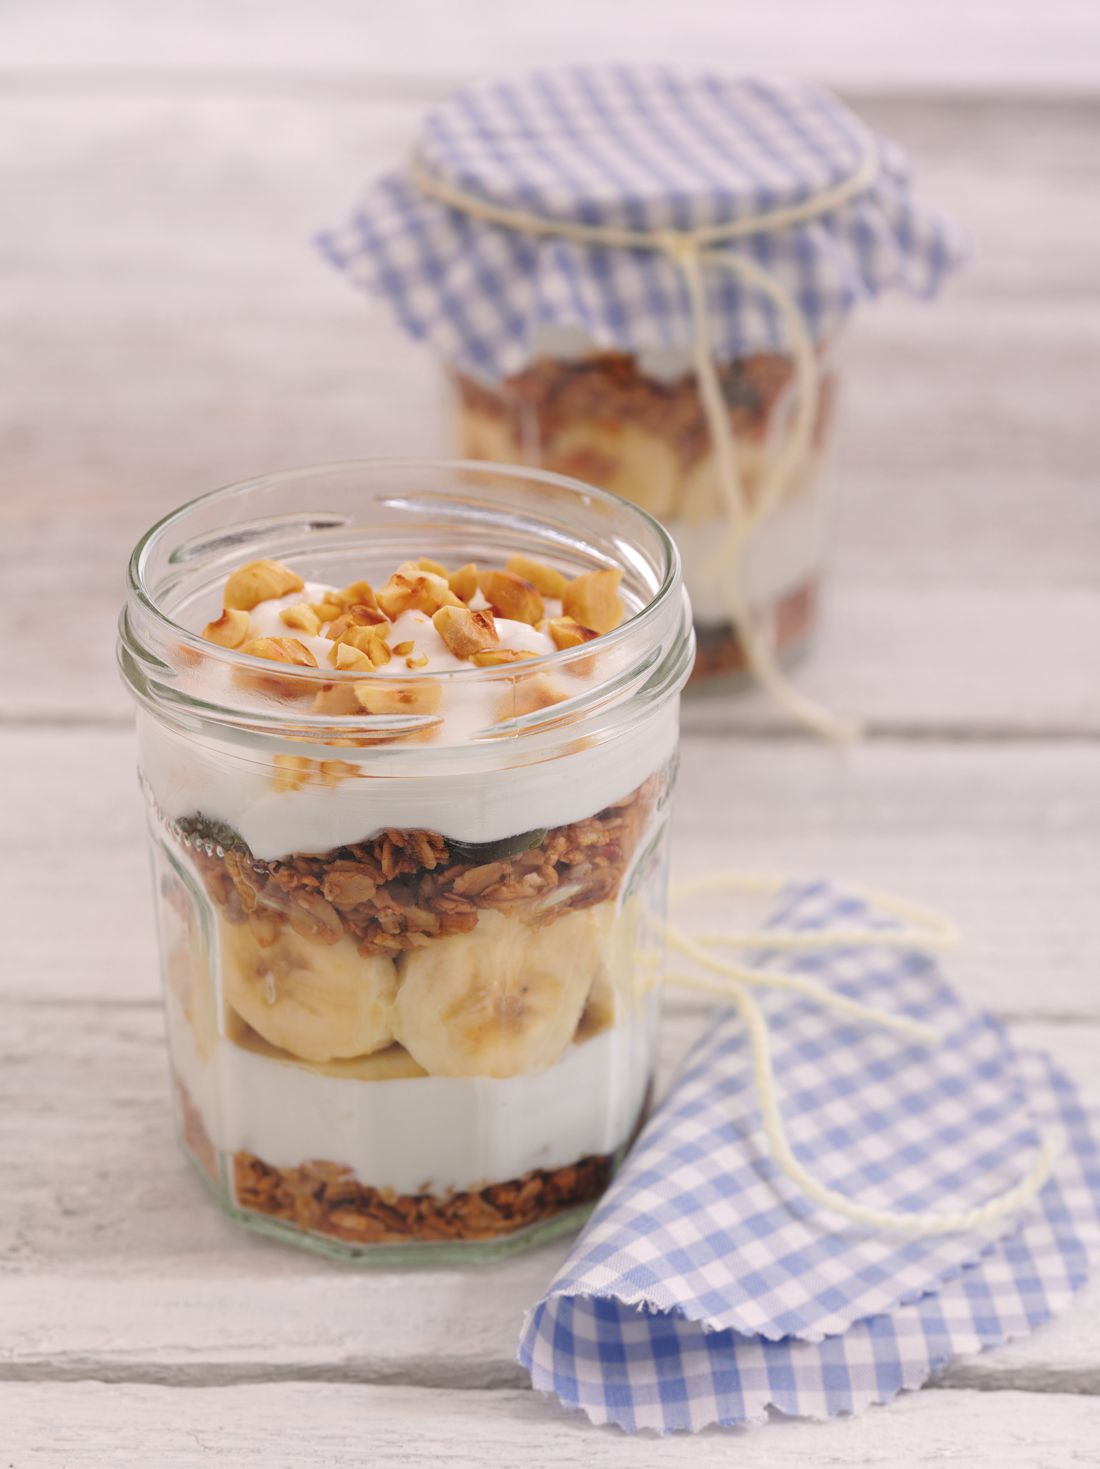 Yoghurt, Granola, Cereals, Oats, Bananas, Greek Yoghurt, Nuts and Honey